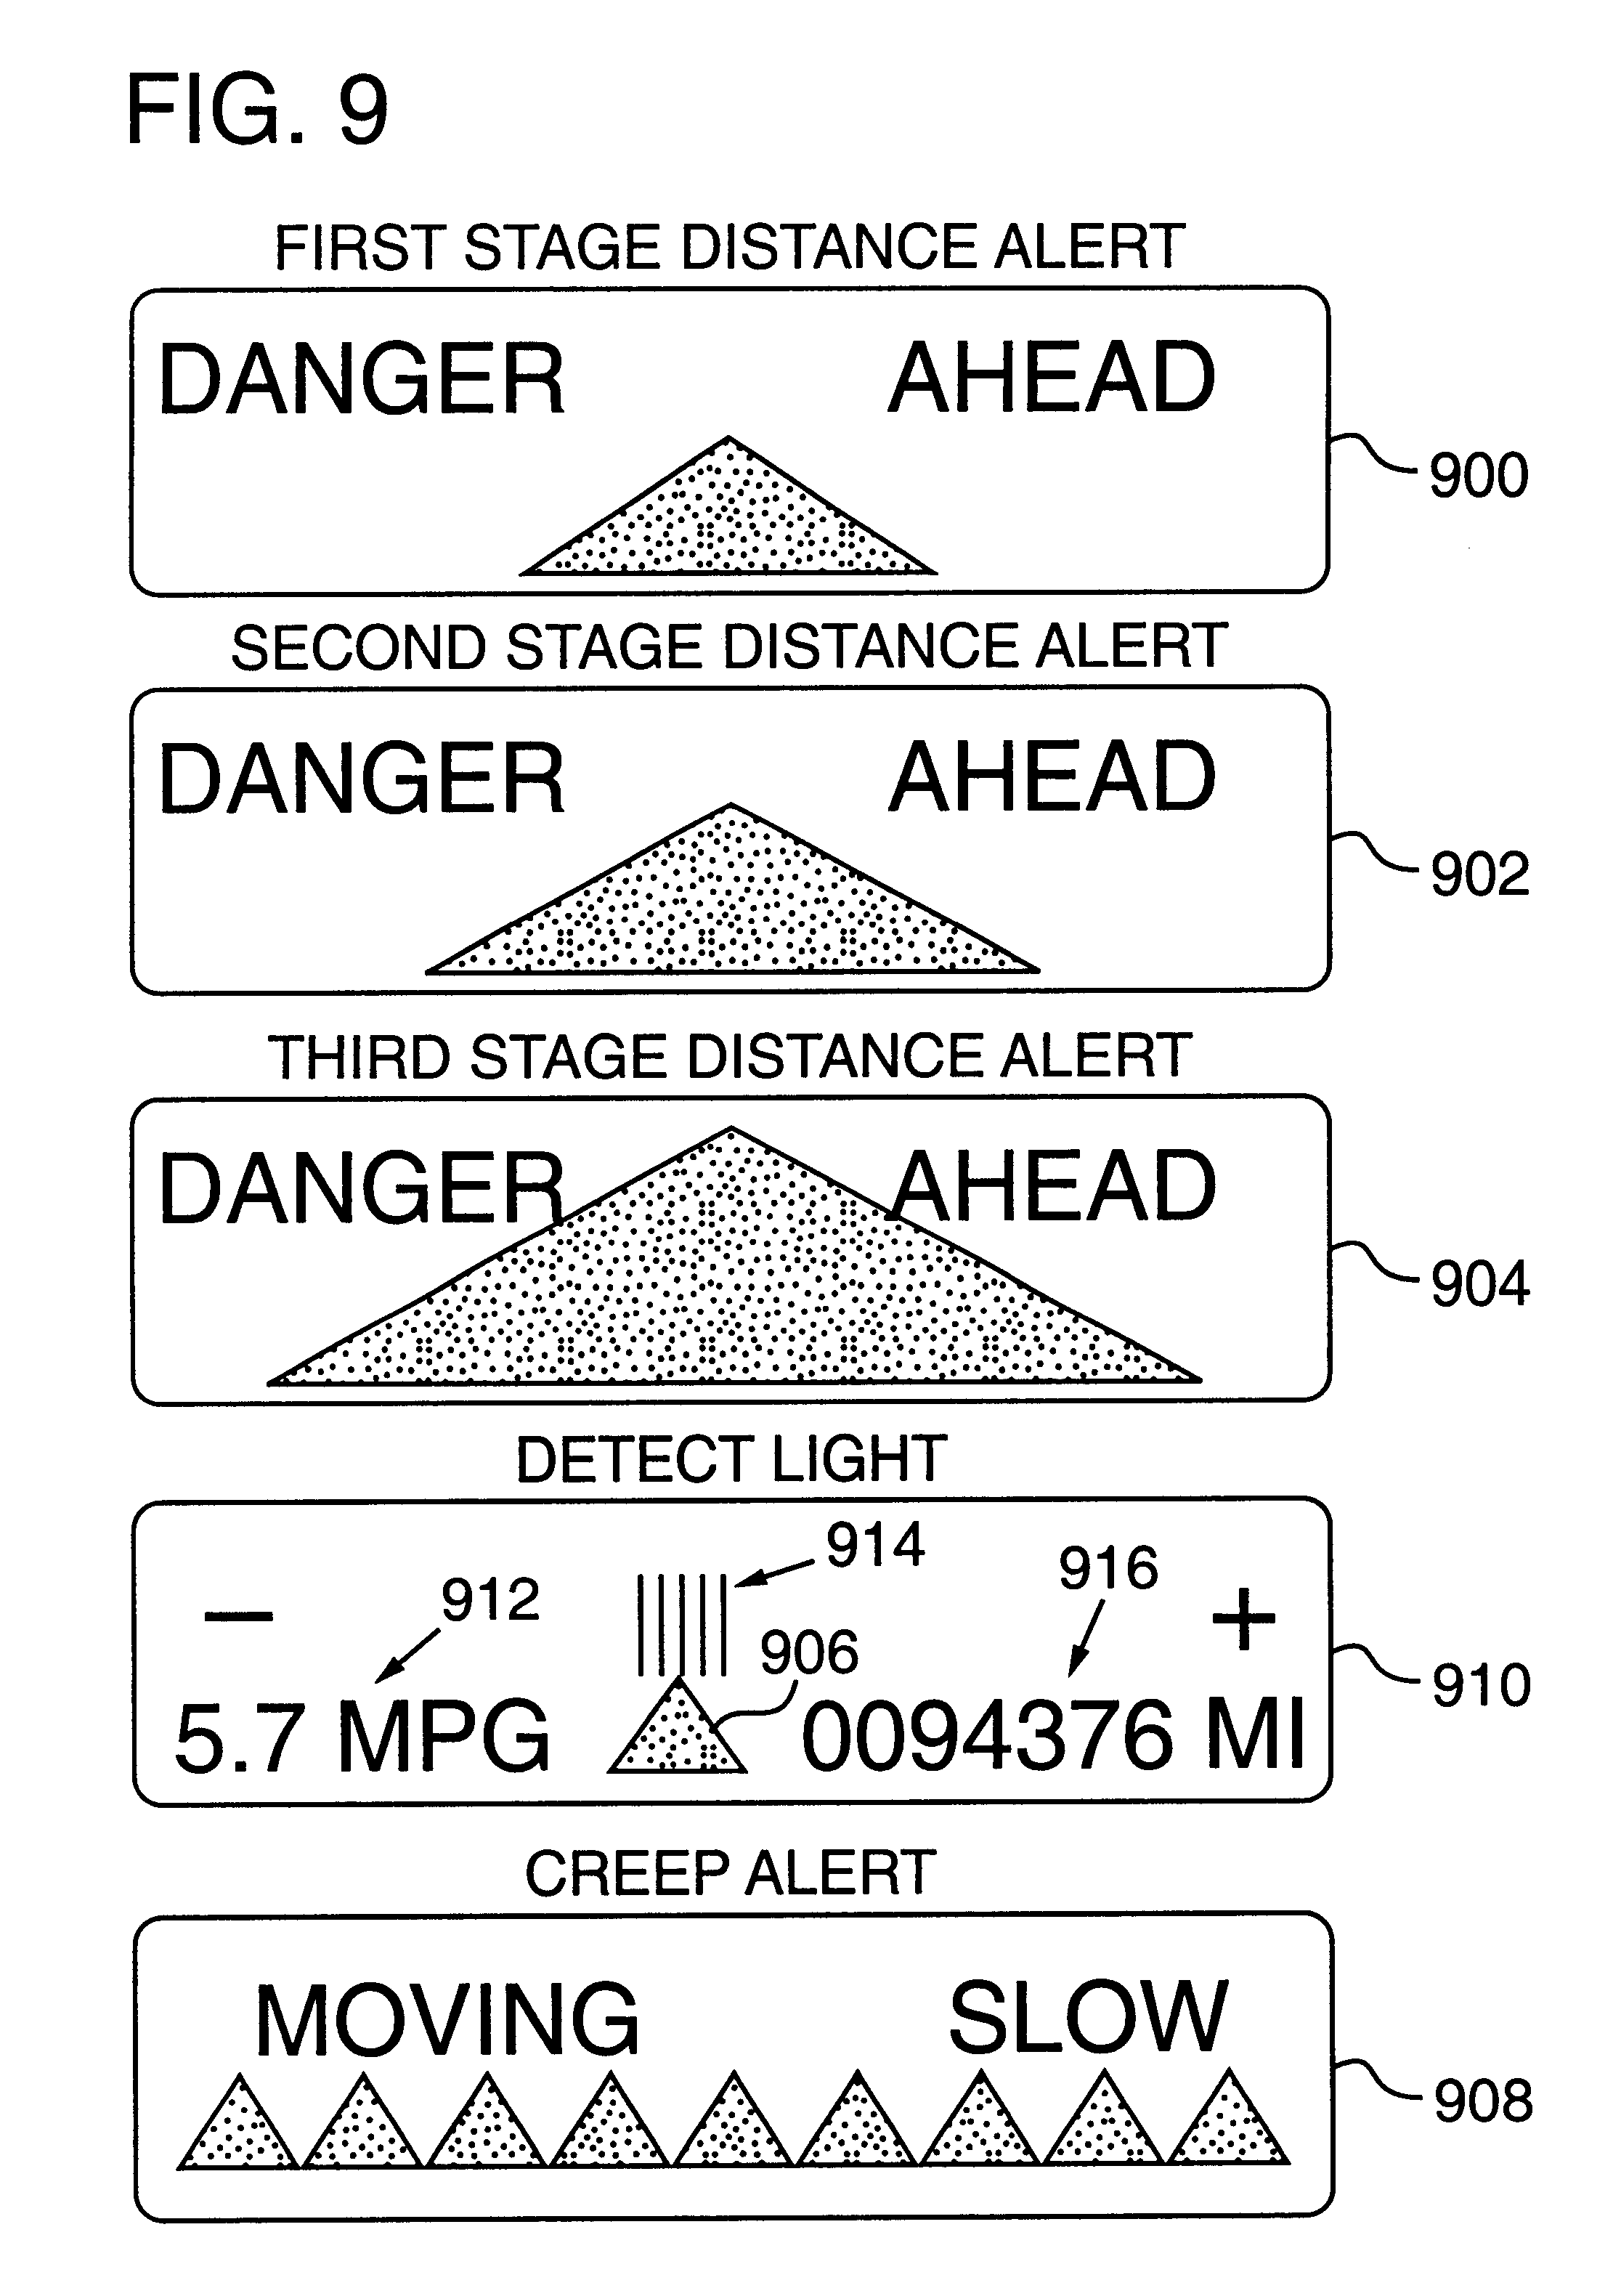 Patent US 6,289,332 B2